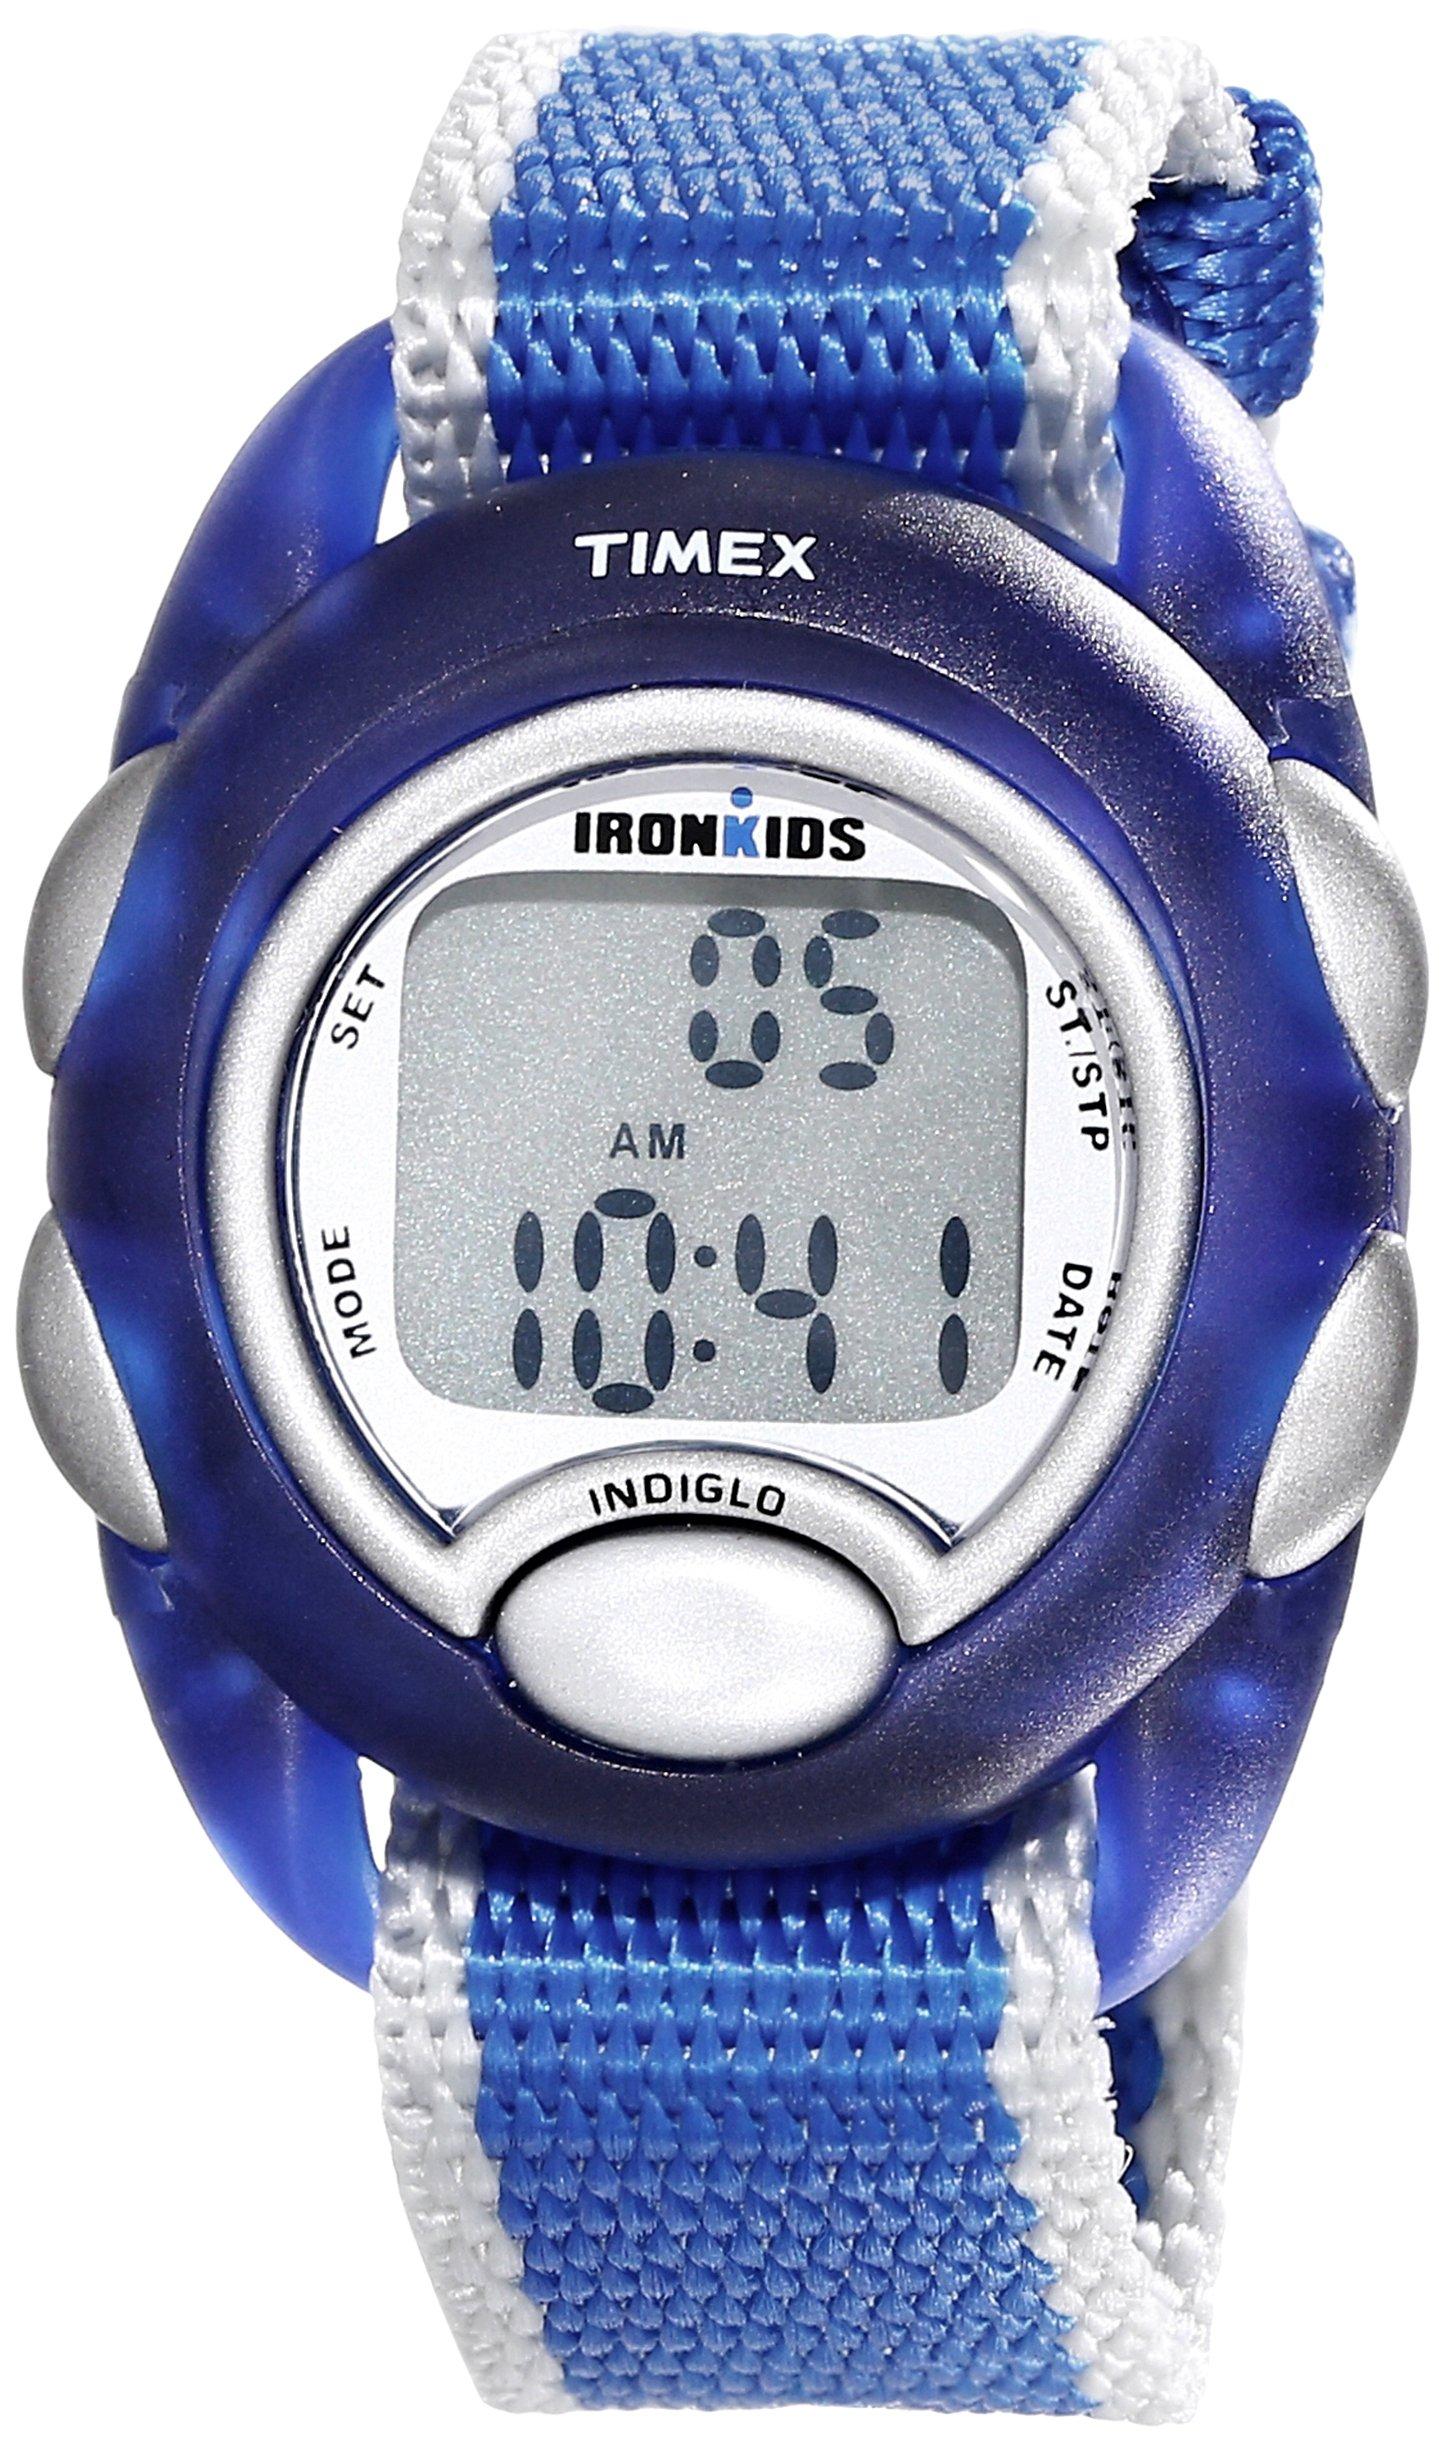 Timex Kids' T7B9829J IronKids Translucent Blue Sport Watch by Timex